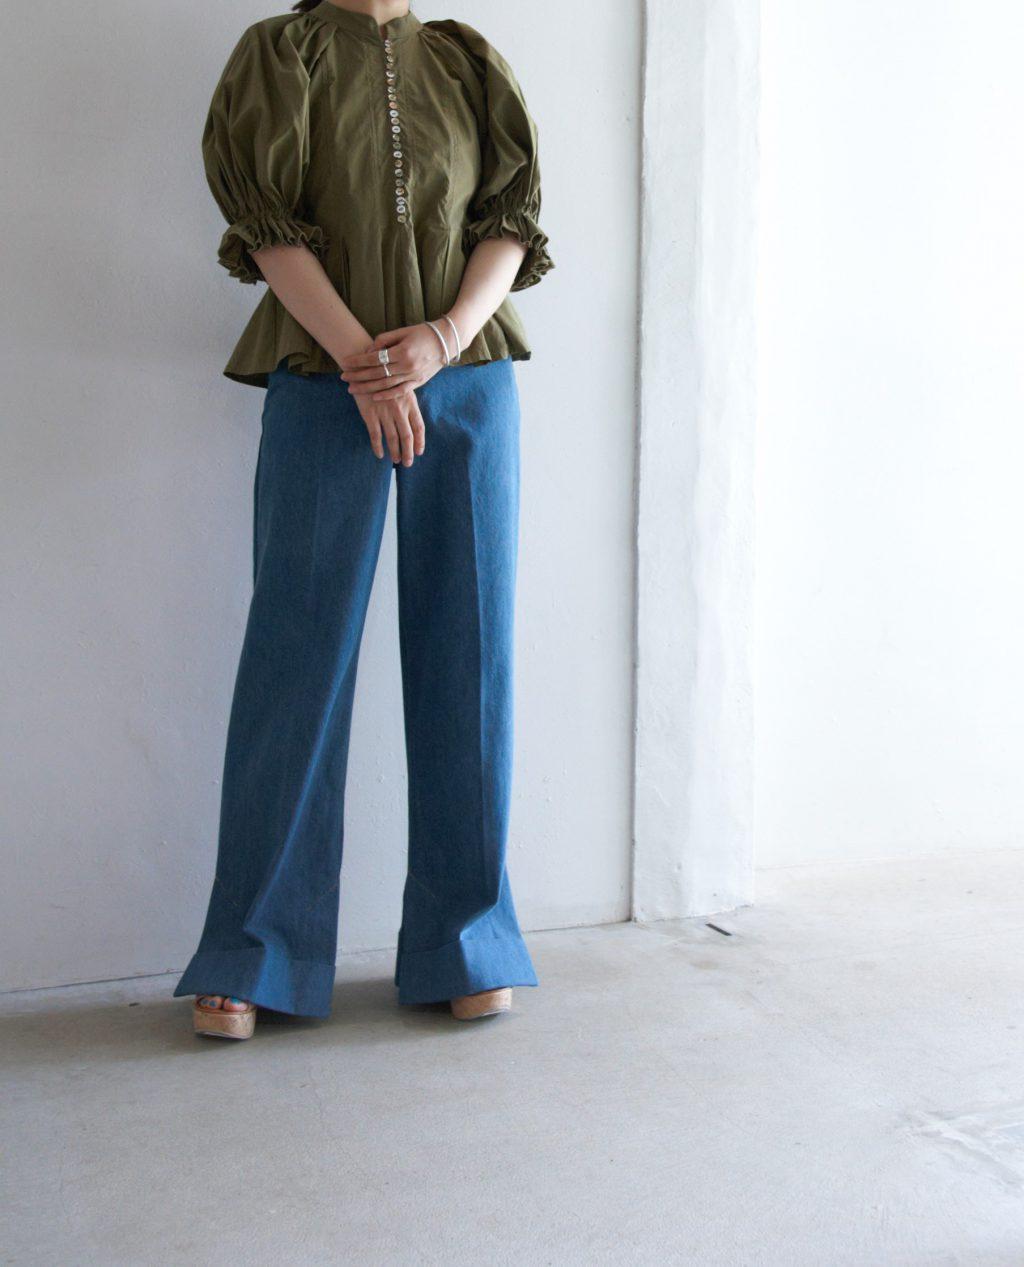 07df67877a19 KAREN WALKER(カレン・ウォーカー)は、ニュージーランド出身のKaren Walkerにより1989年に創設。